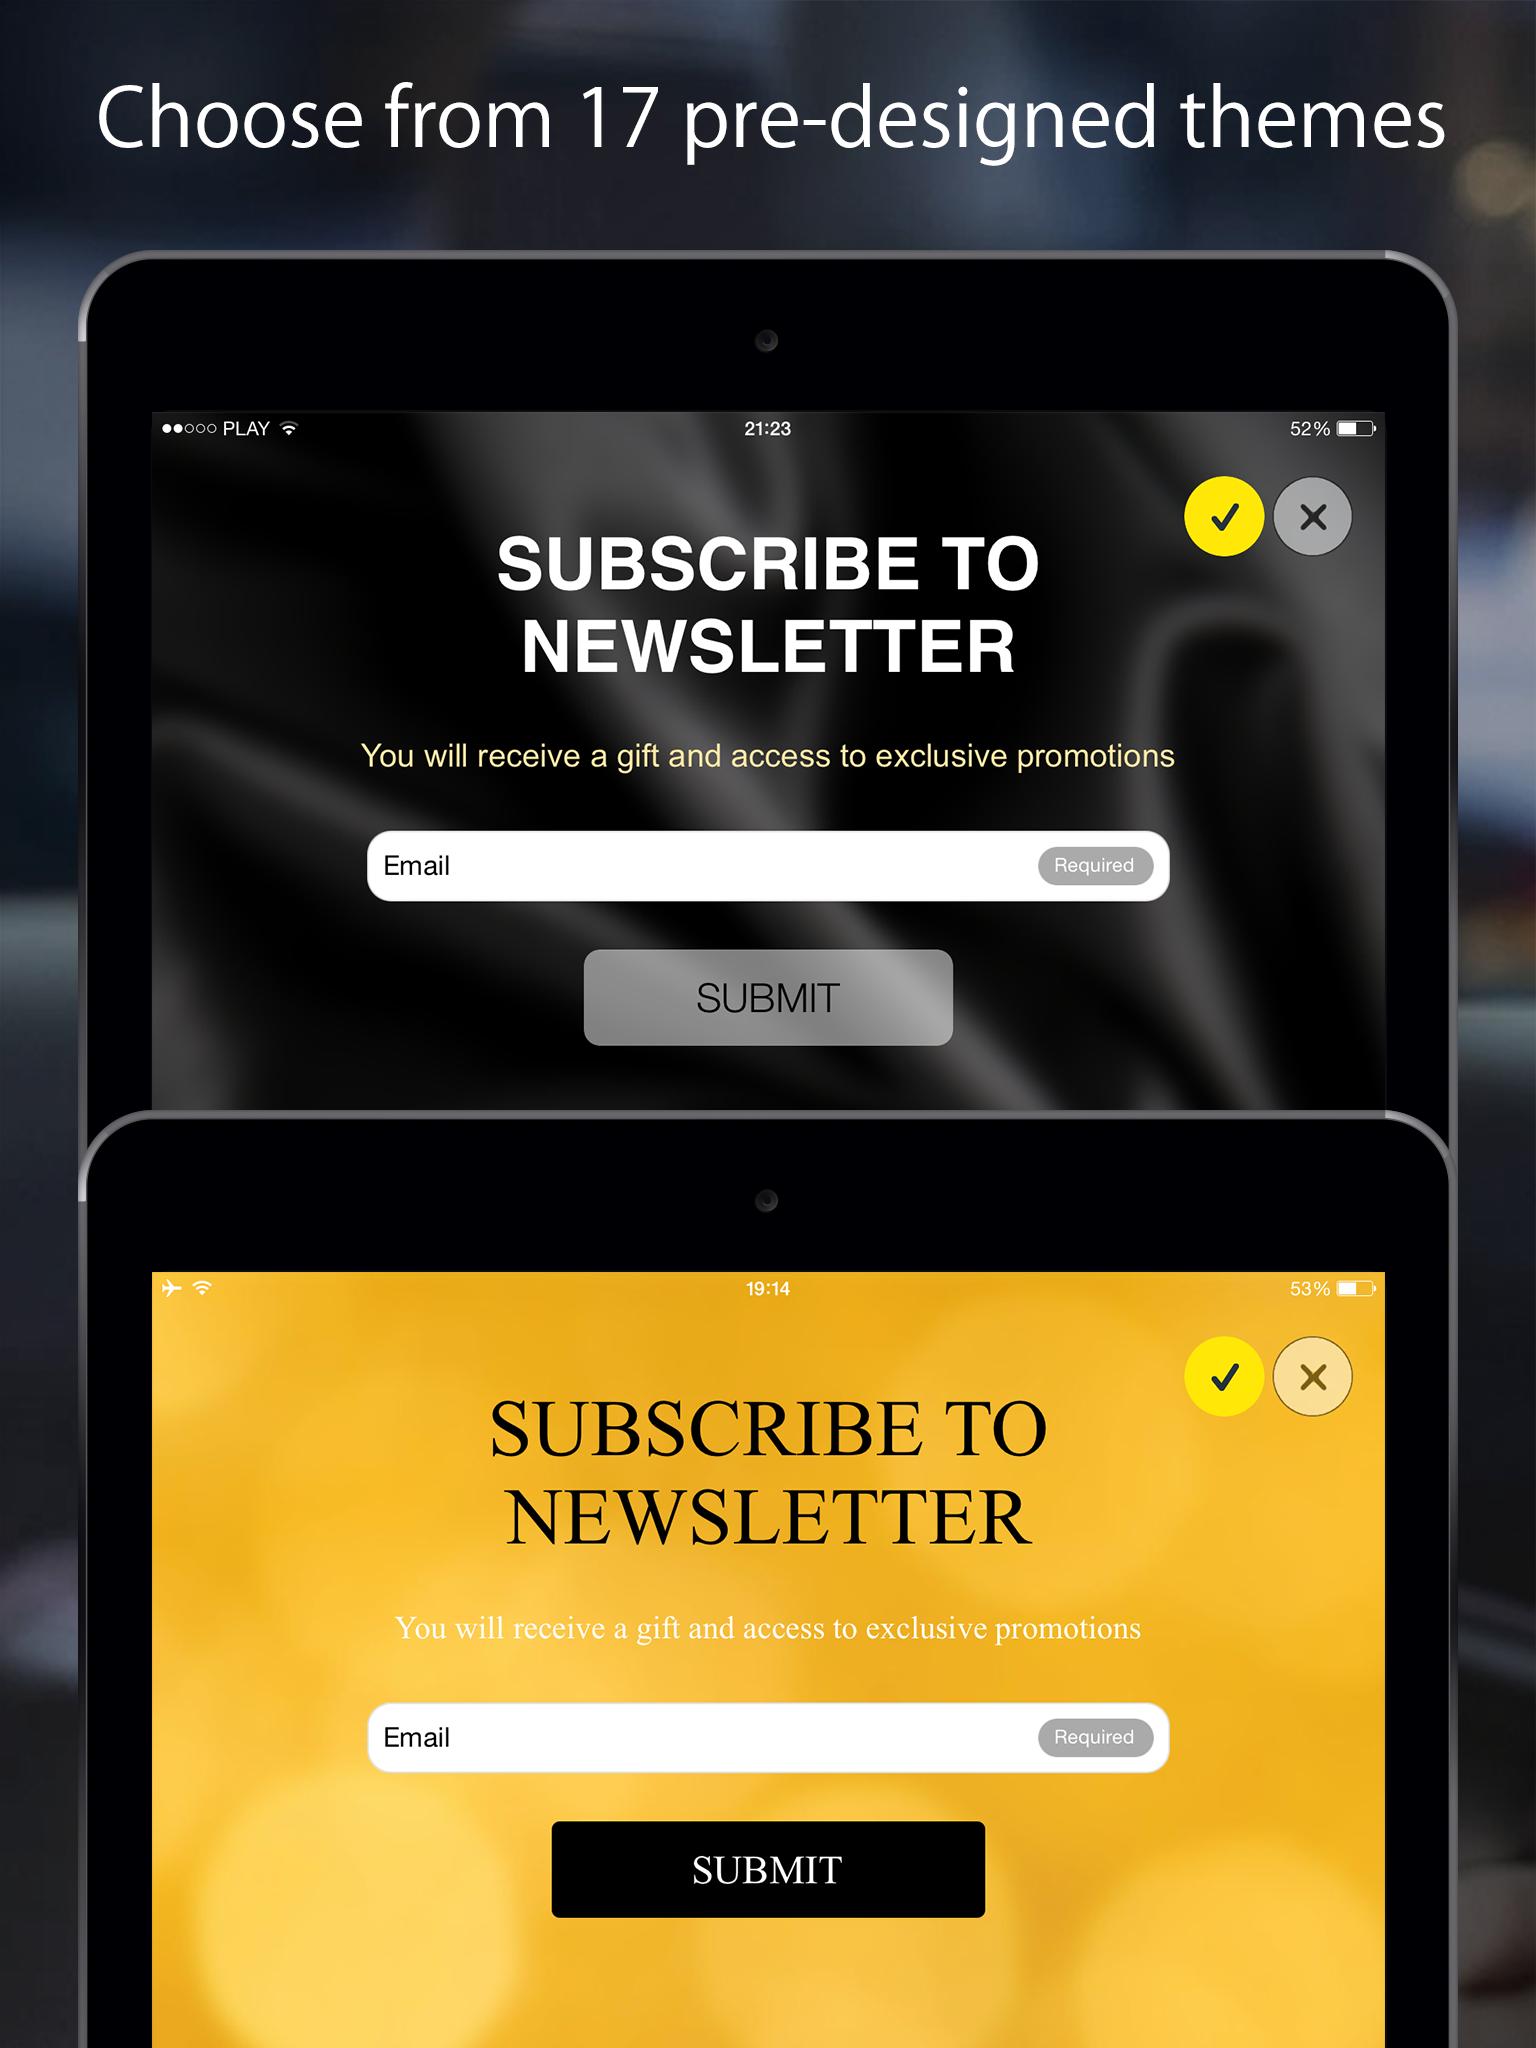 FreshForm - our mobile application for tablets